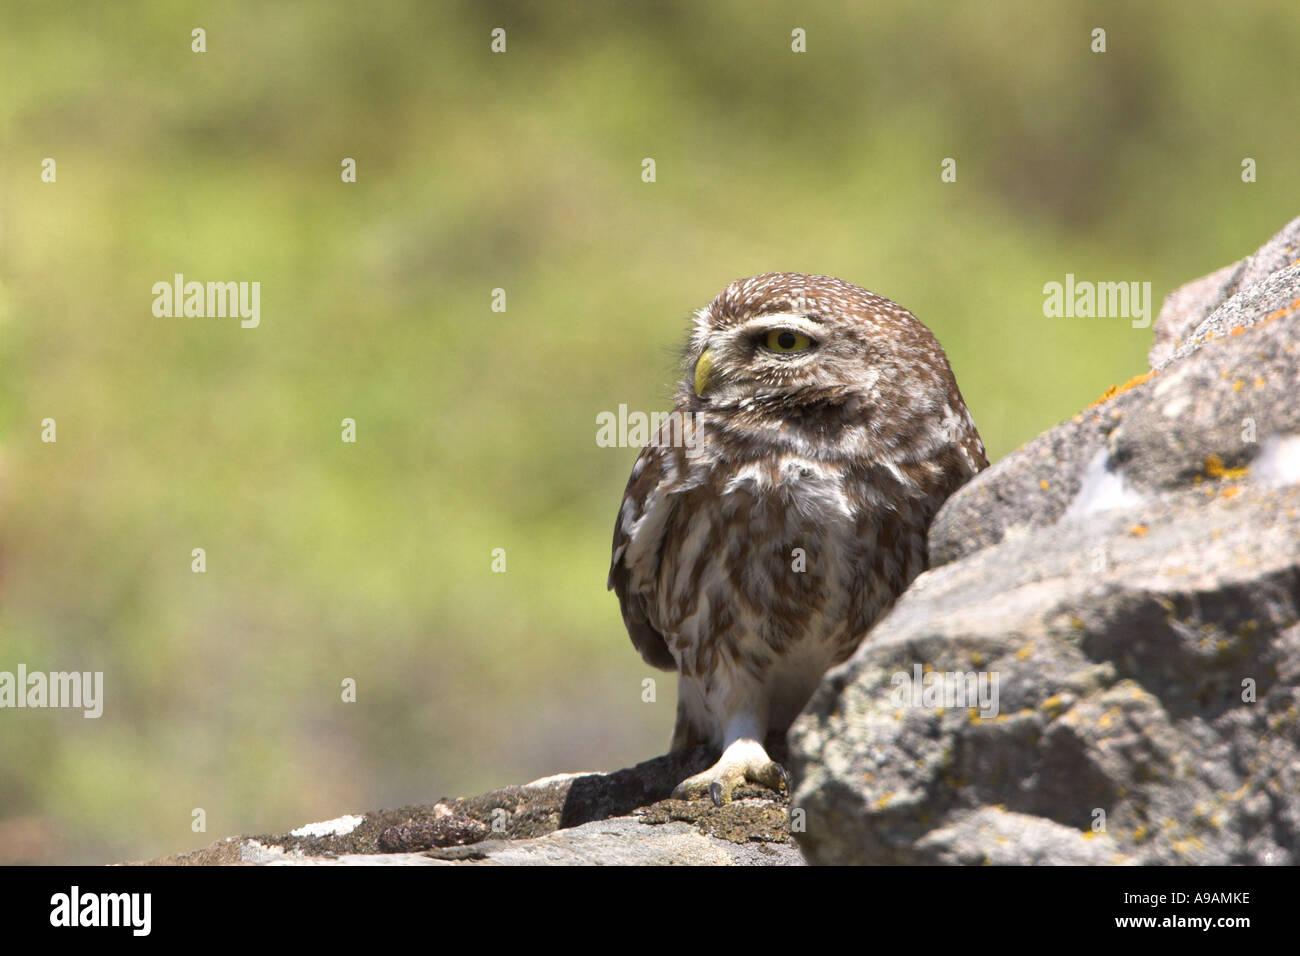 Little Owl, Athene noctua, sunbathing on rock on Greek Island of Lesbos - Stock Image